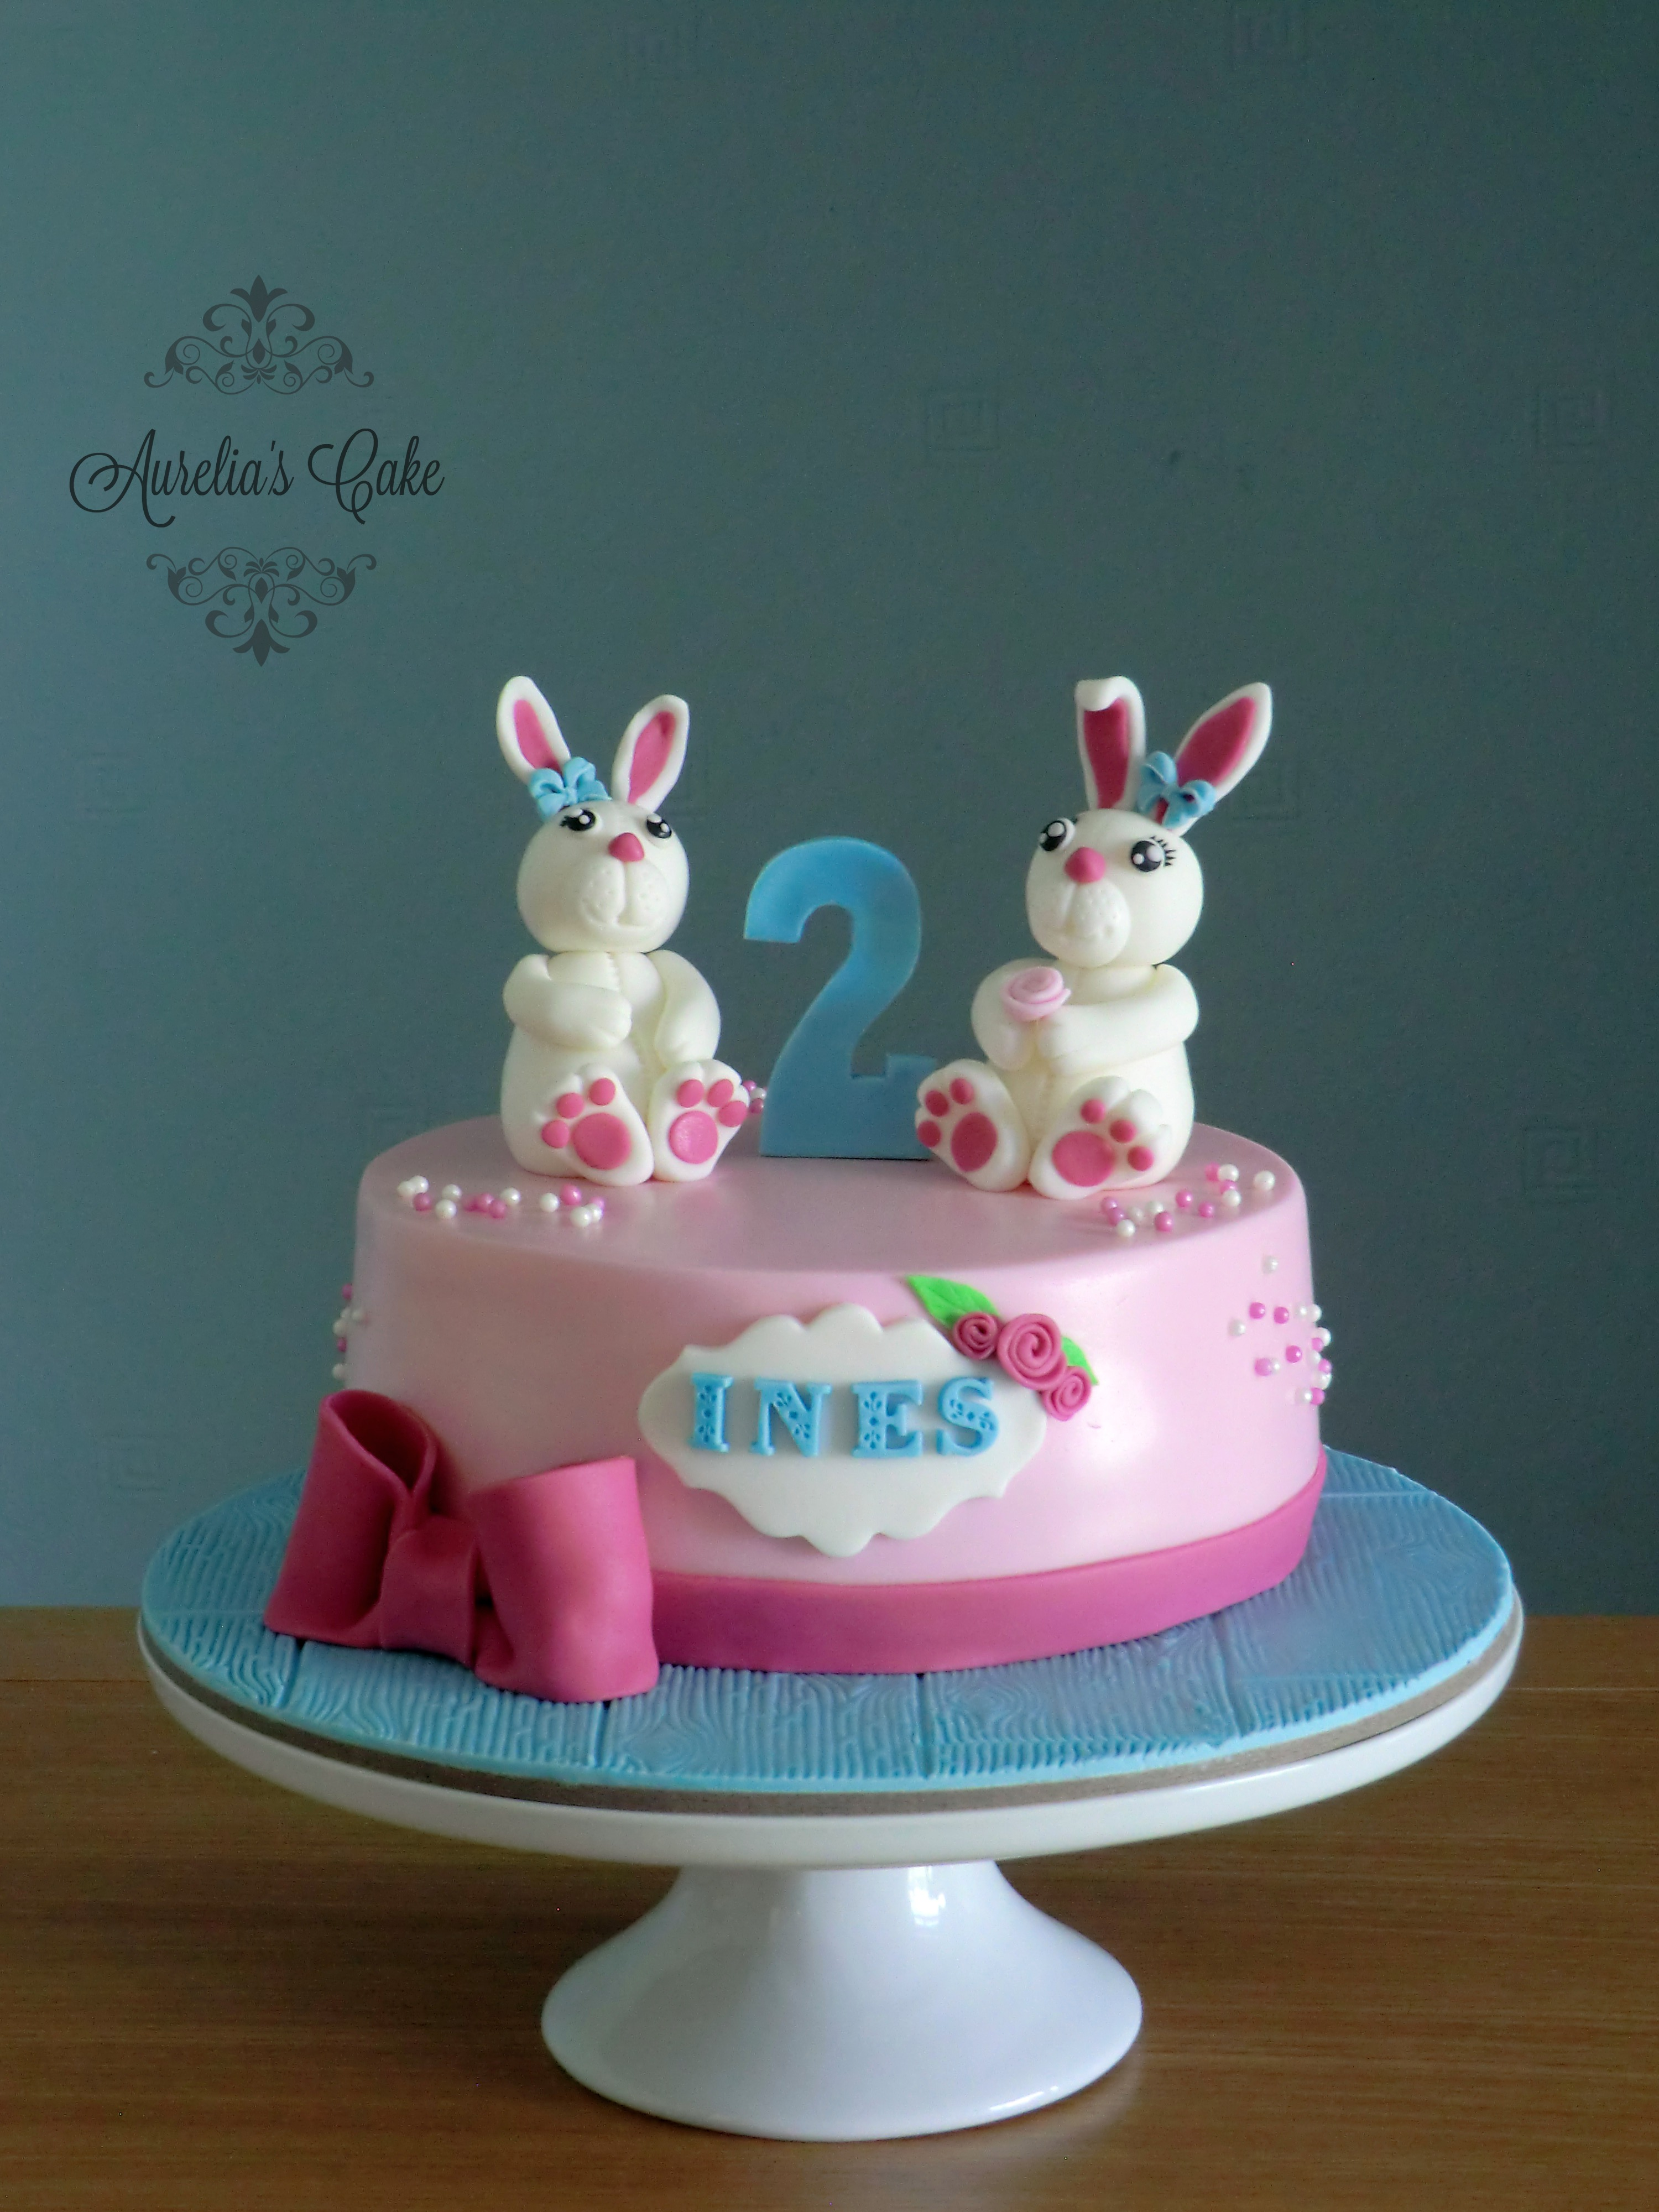 Bunny cake.